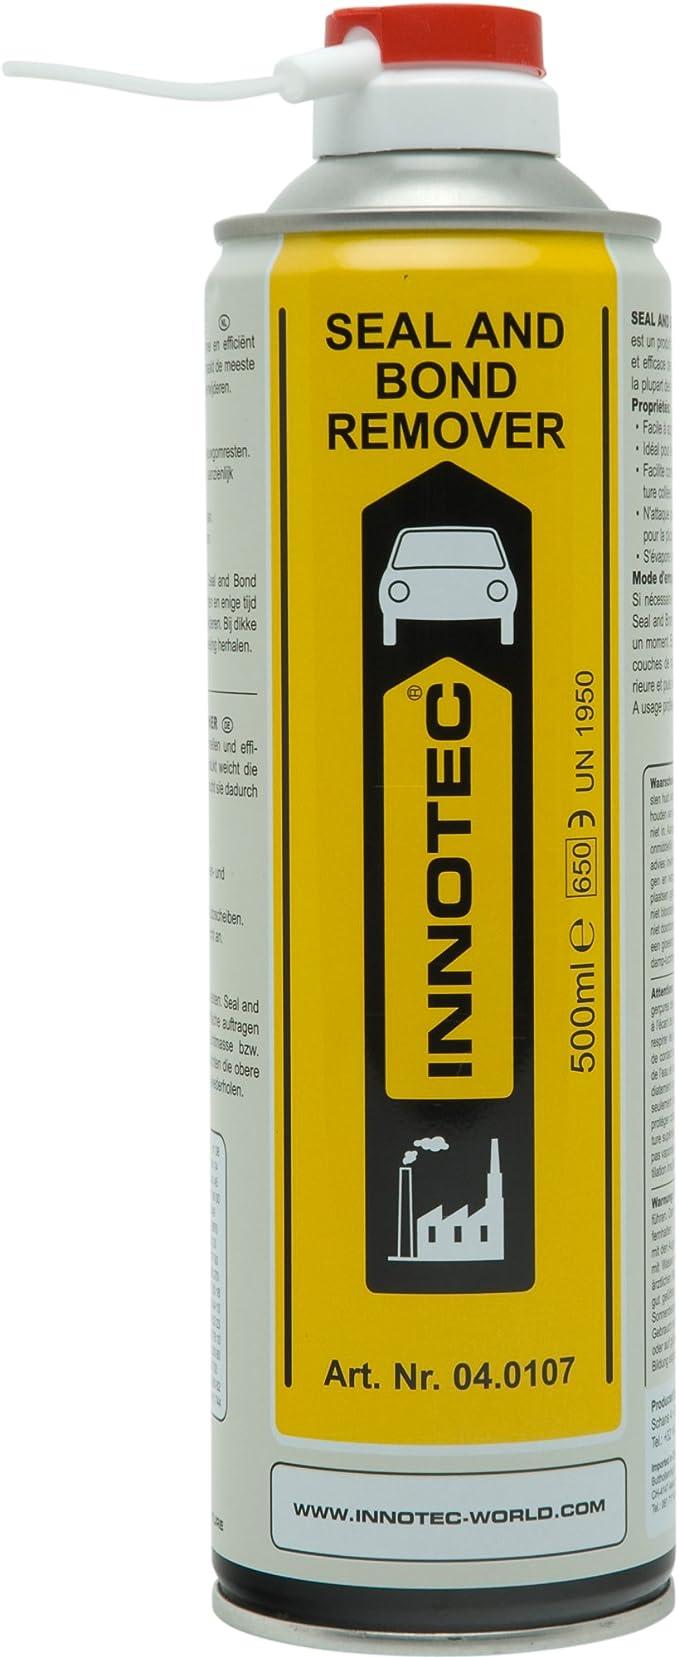 Innotec I04 0107 Innotec Seal And Bond Remover Reinigungsmittel 500 Ml Spraydose Auto